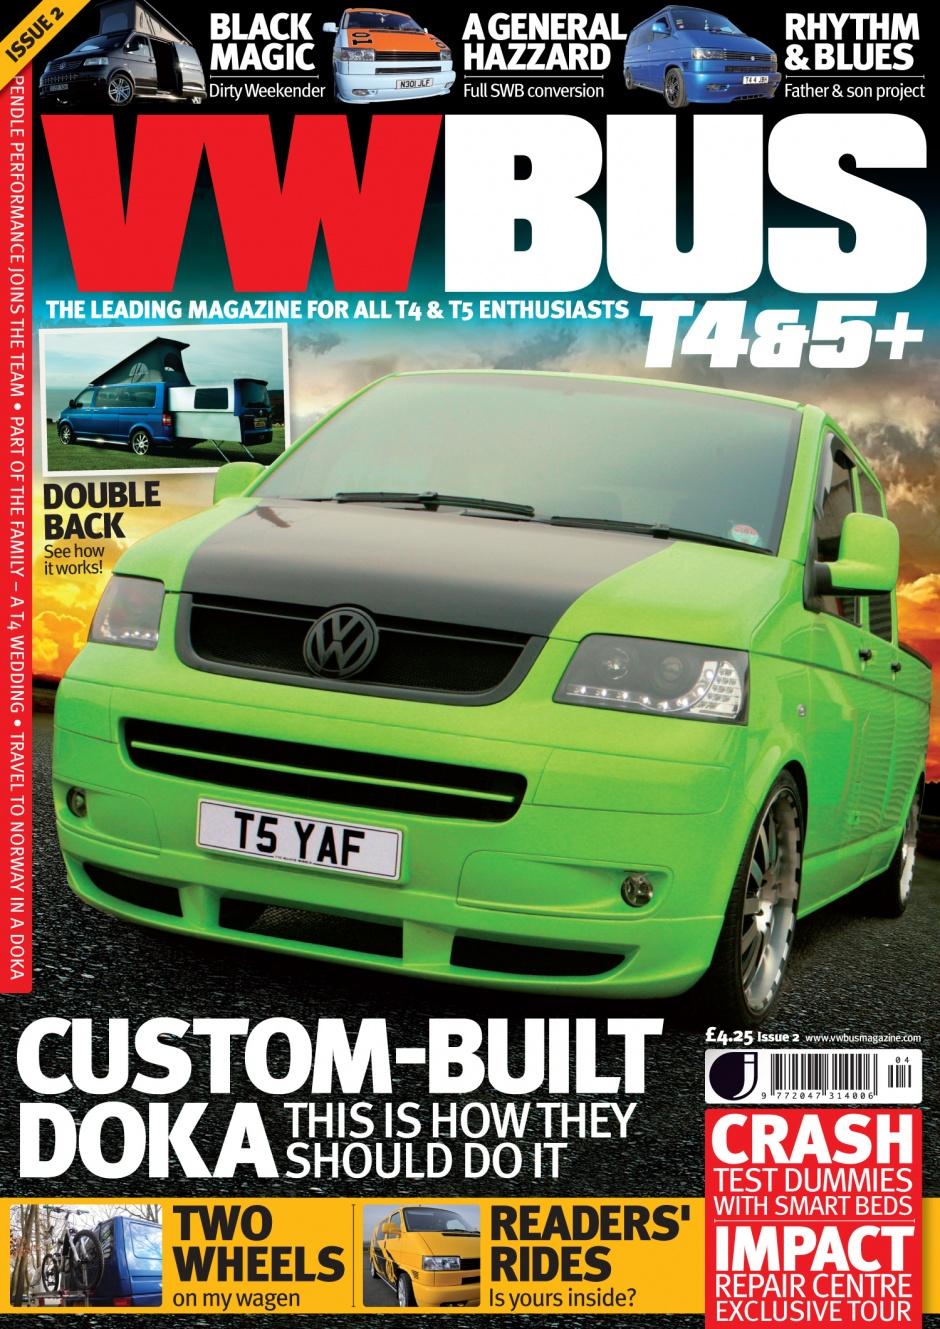 vw bus t4 t5 magazine 2 vwbus t4 t5. Black Bedroom Furniture Sets. Home Design Ideas